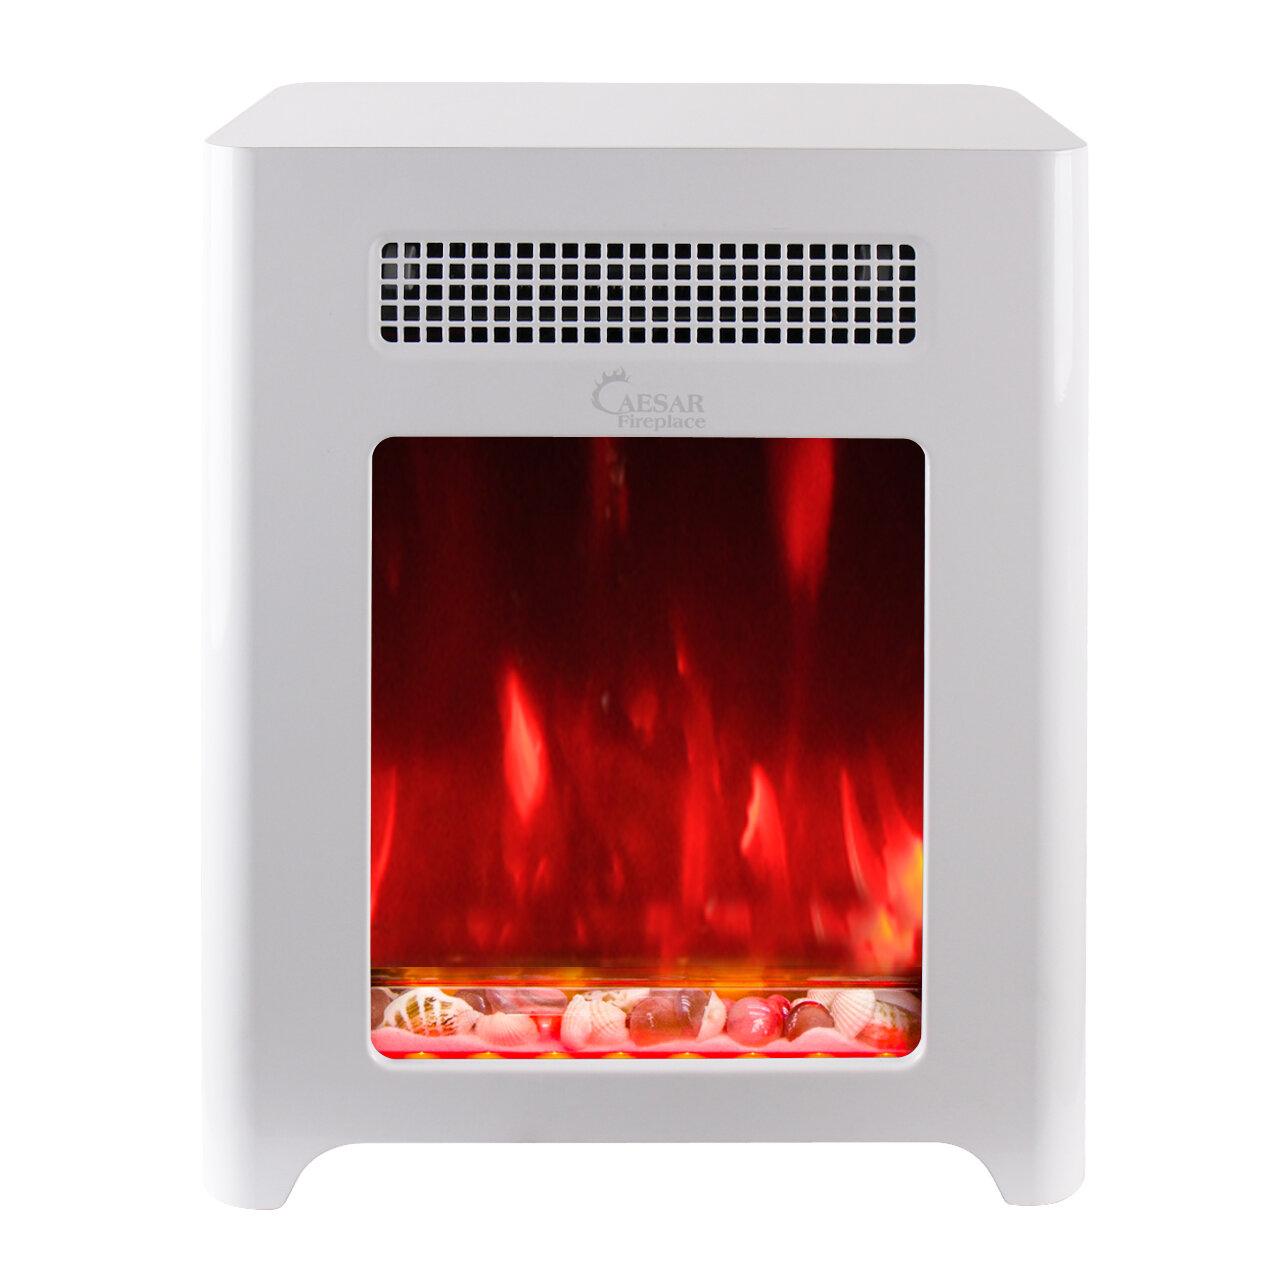 mini electric fireplace heater. Caesar Hardware International Limited Luxury Portable Mini Indoor Compact Freestanding Electric Fireplace | Wayfair Heater E